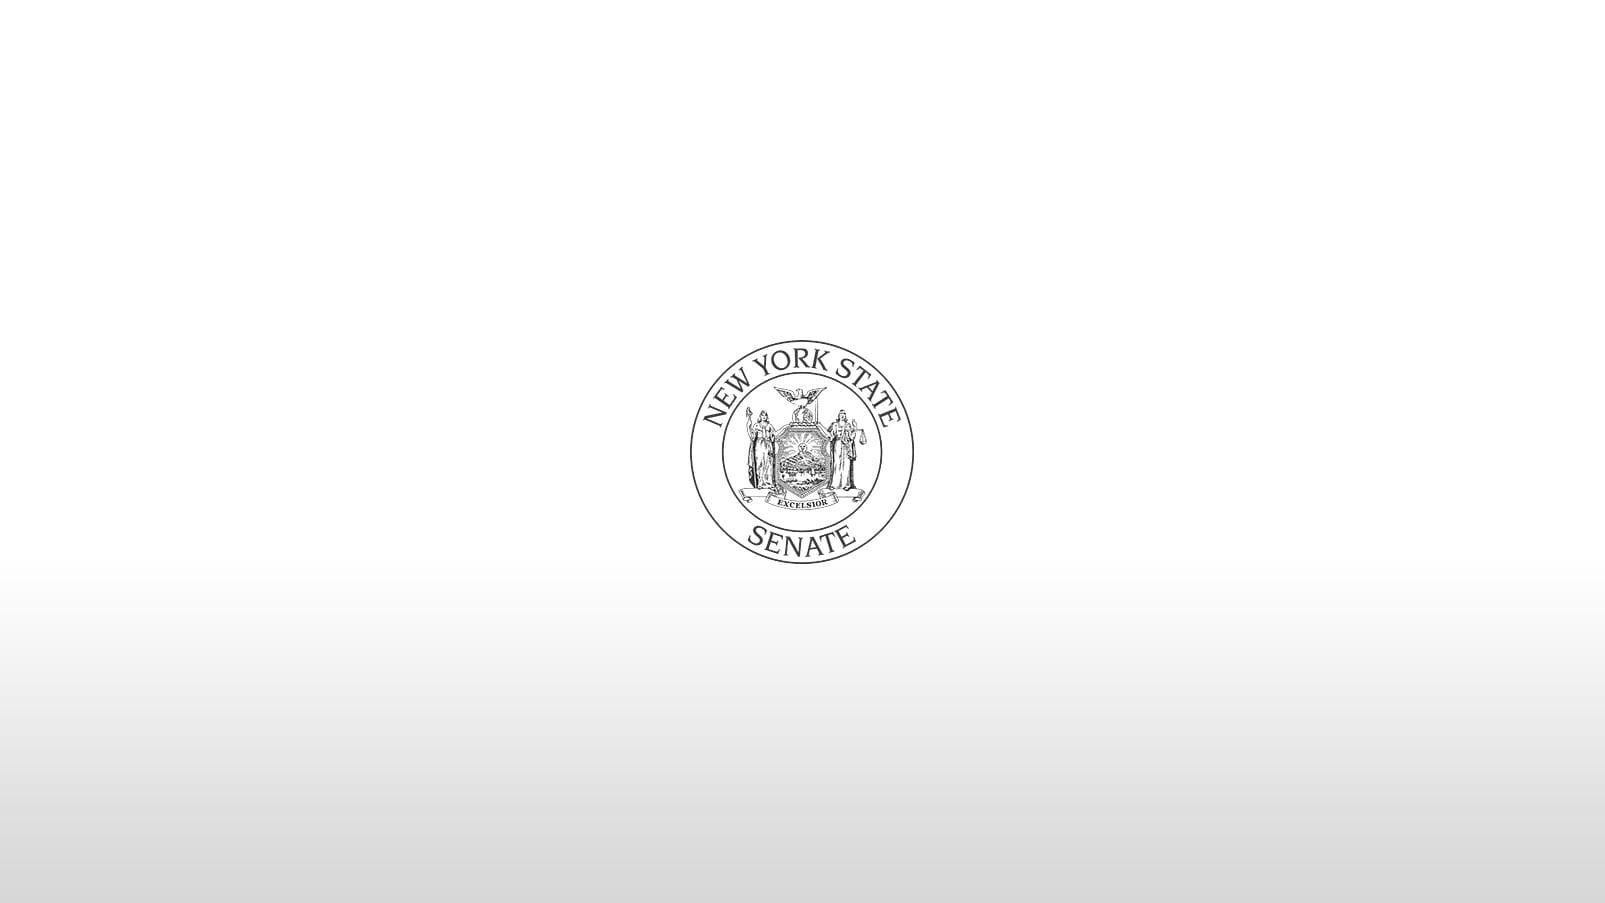 New York Senate Newsroom